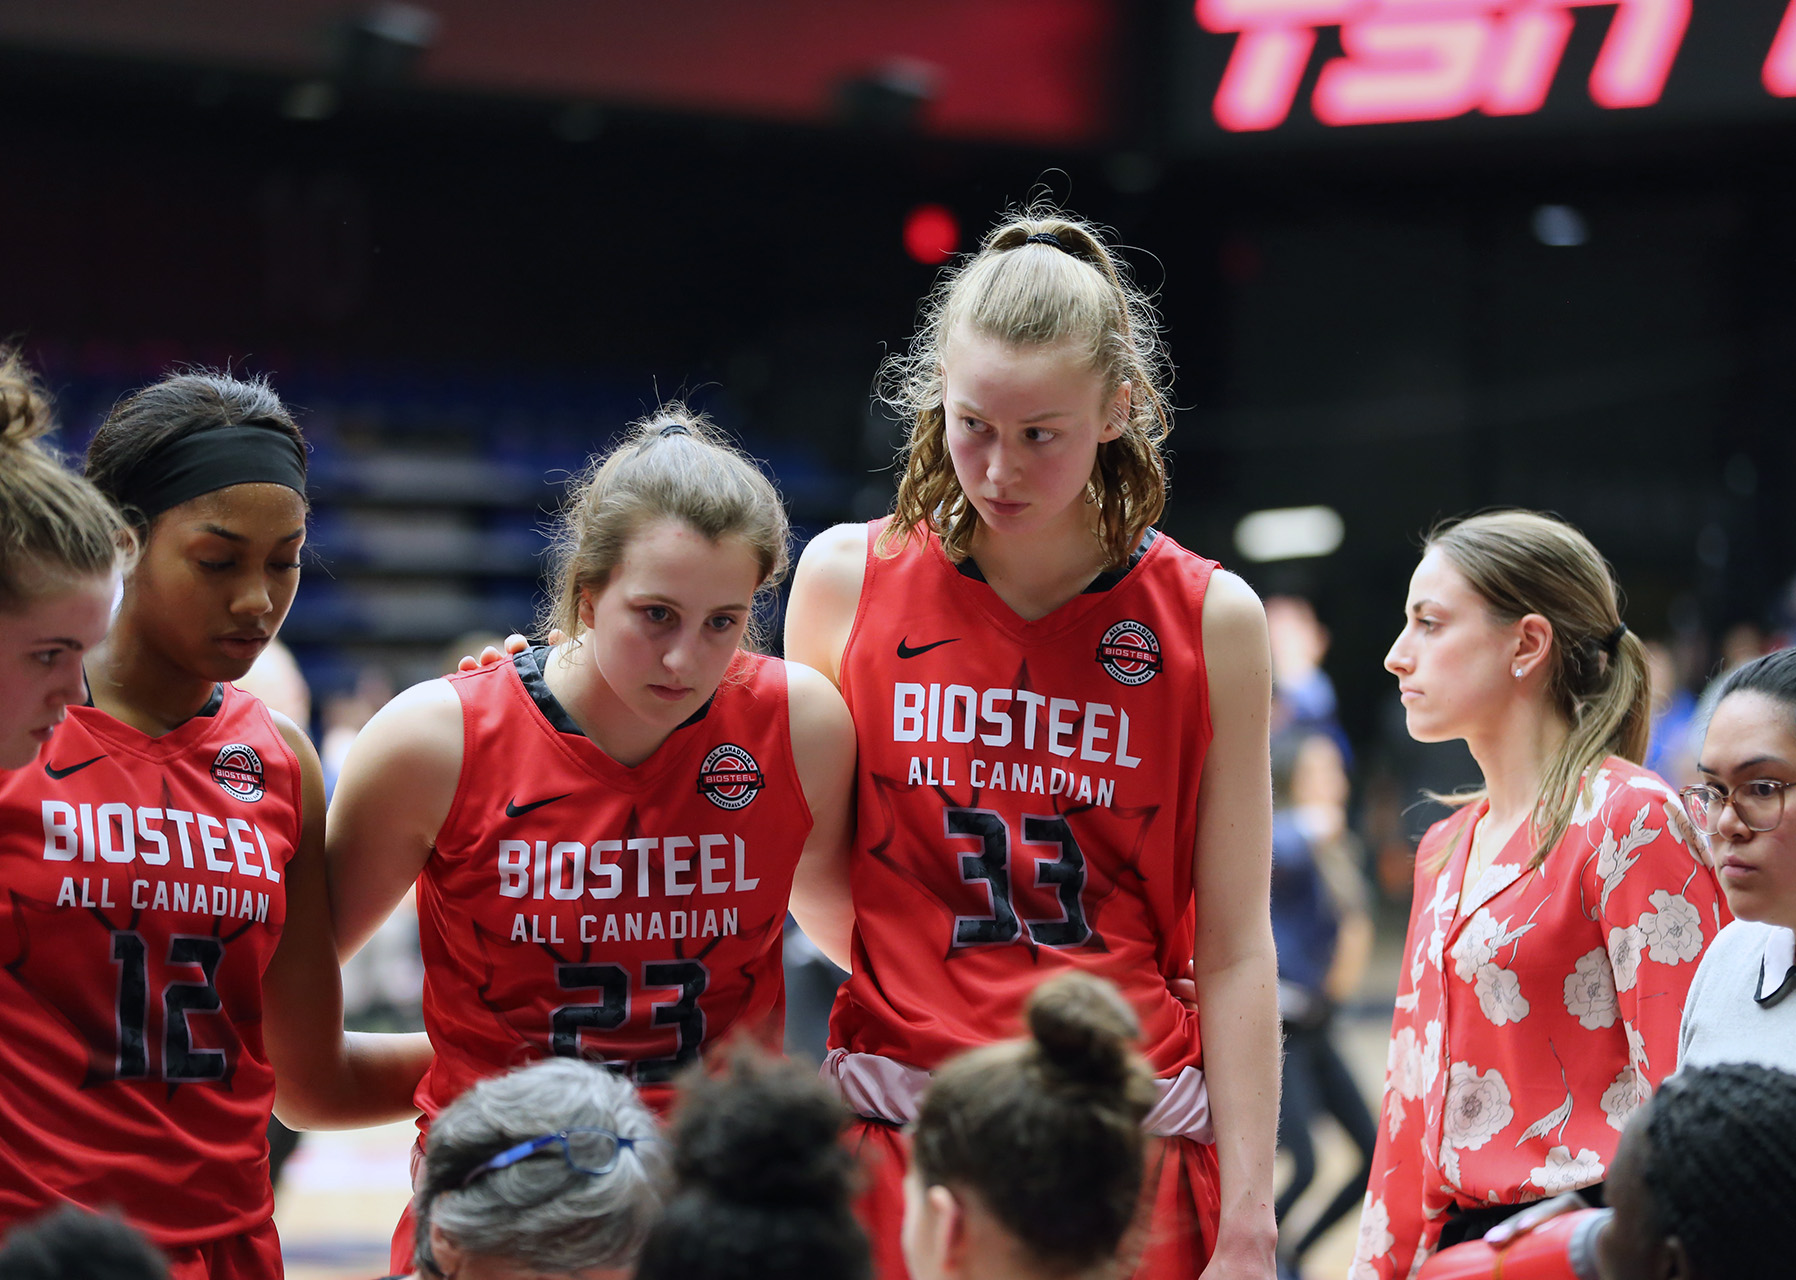 Morgan-Cherchas and Tuchscherer Represent U Sports Recruits at BioSteel All-Canadian Girls Game